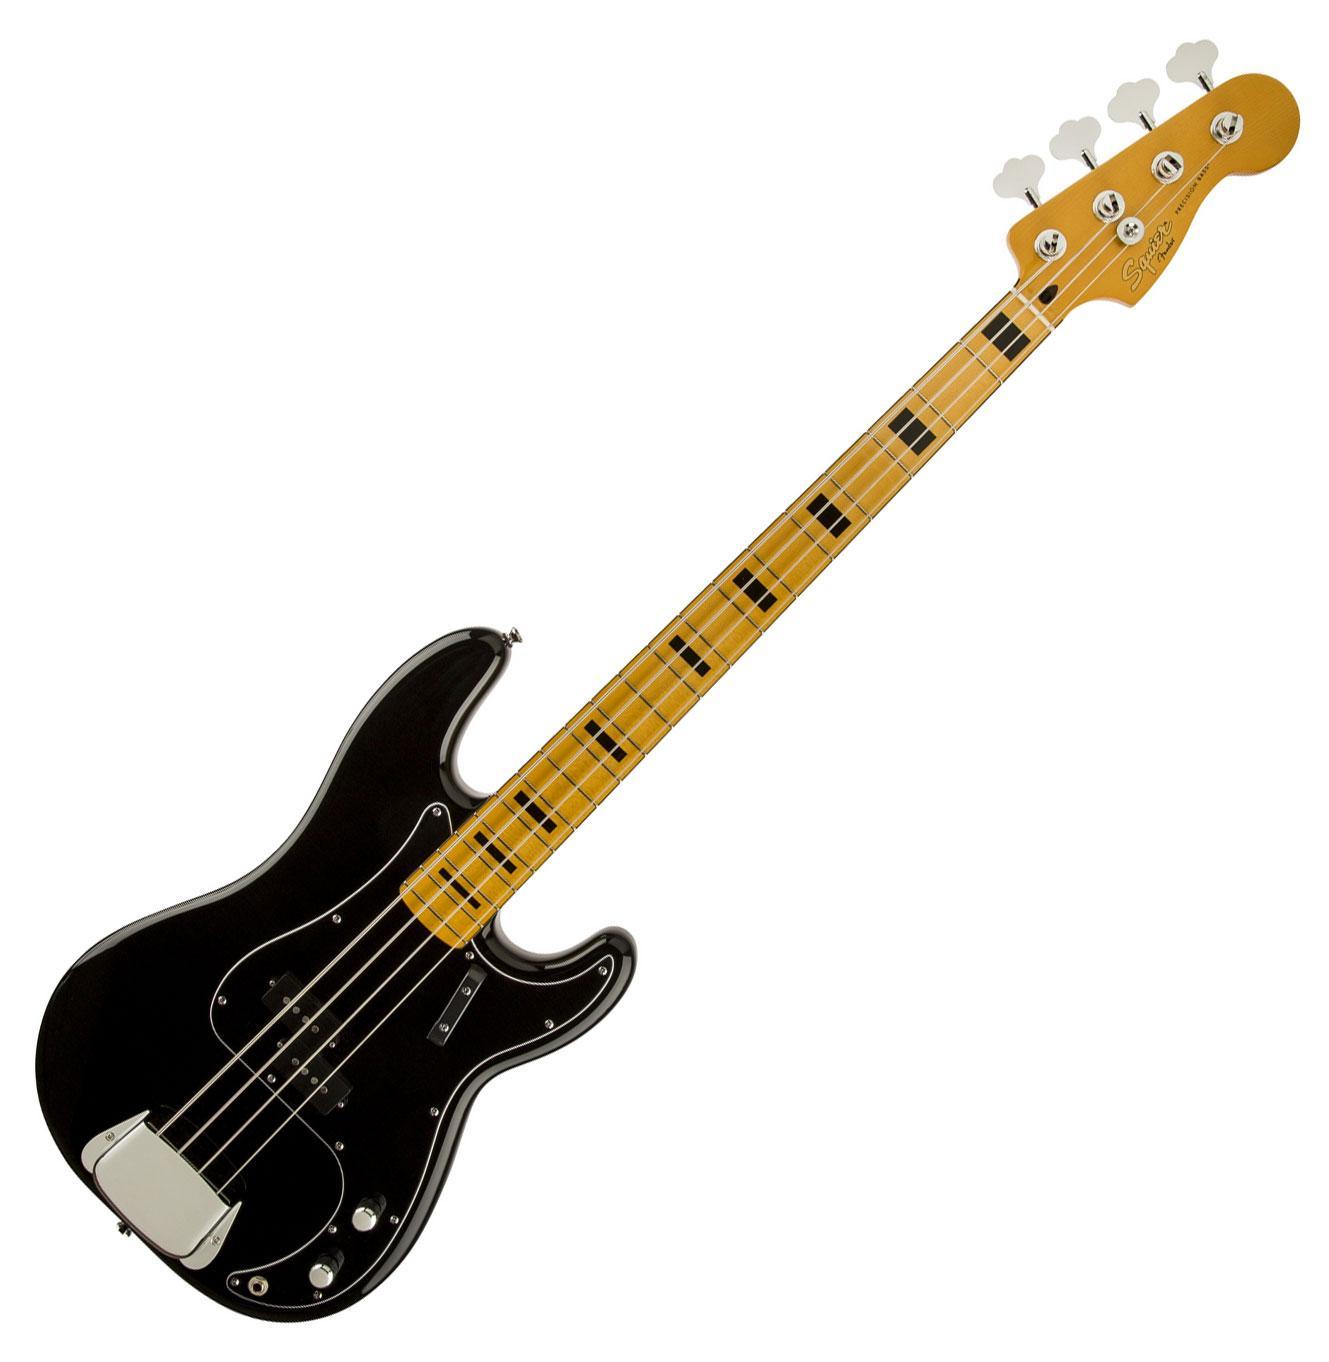 Fender Squier Classic Vibe Precision Bass '70 MN BLK